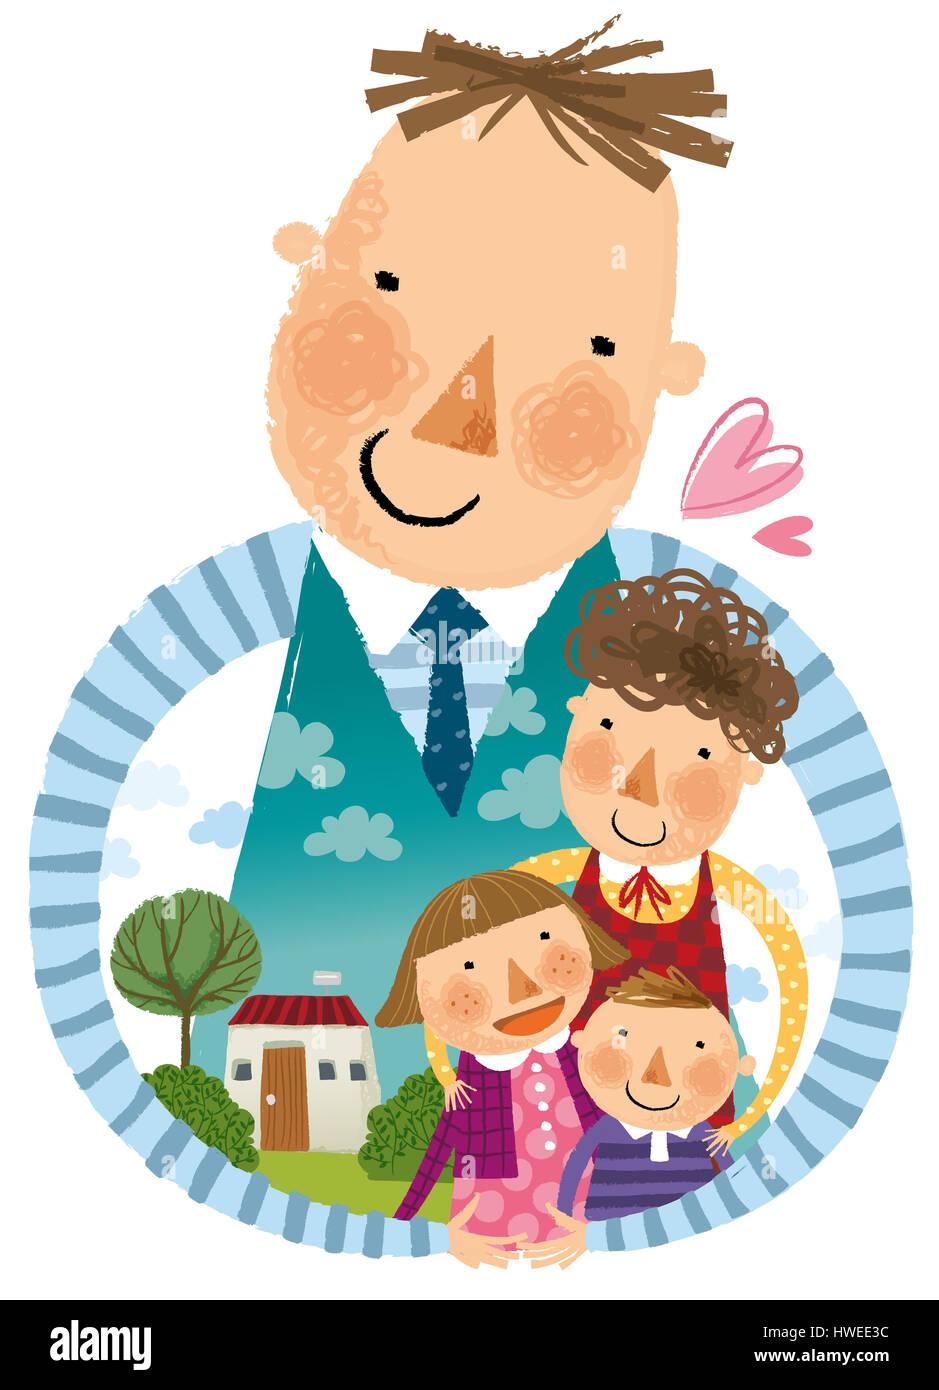 Fathermotherwomanmanchildrenchildboygirlhappyfamilyparents